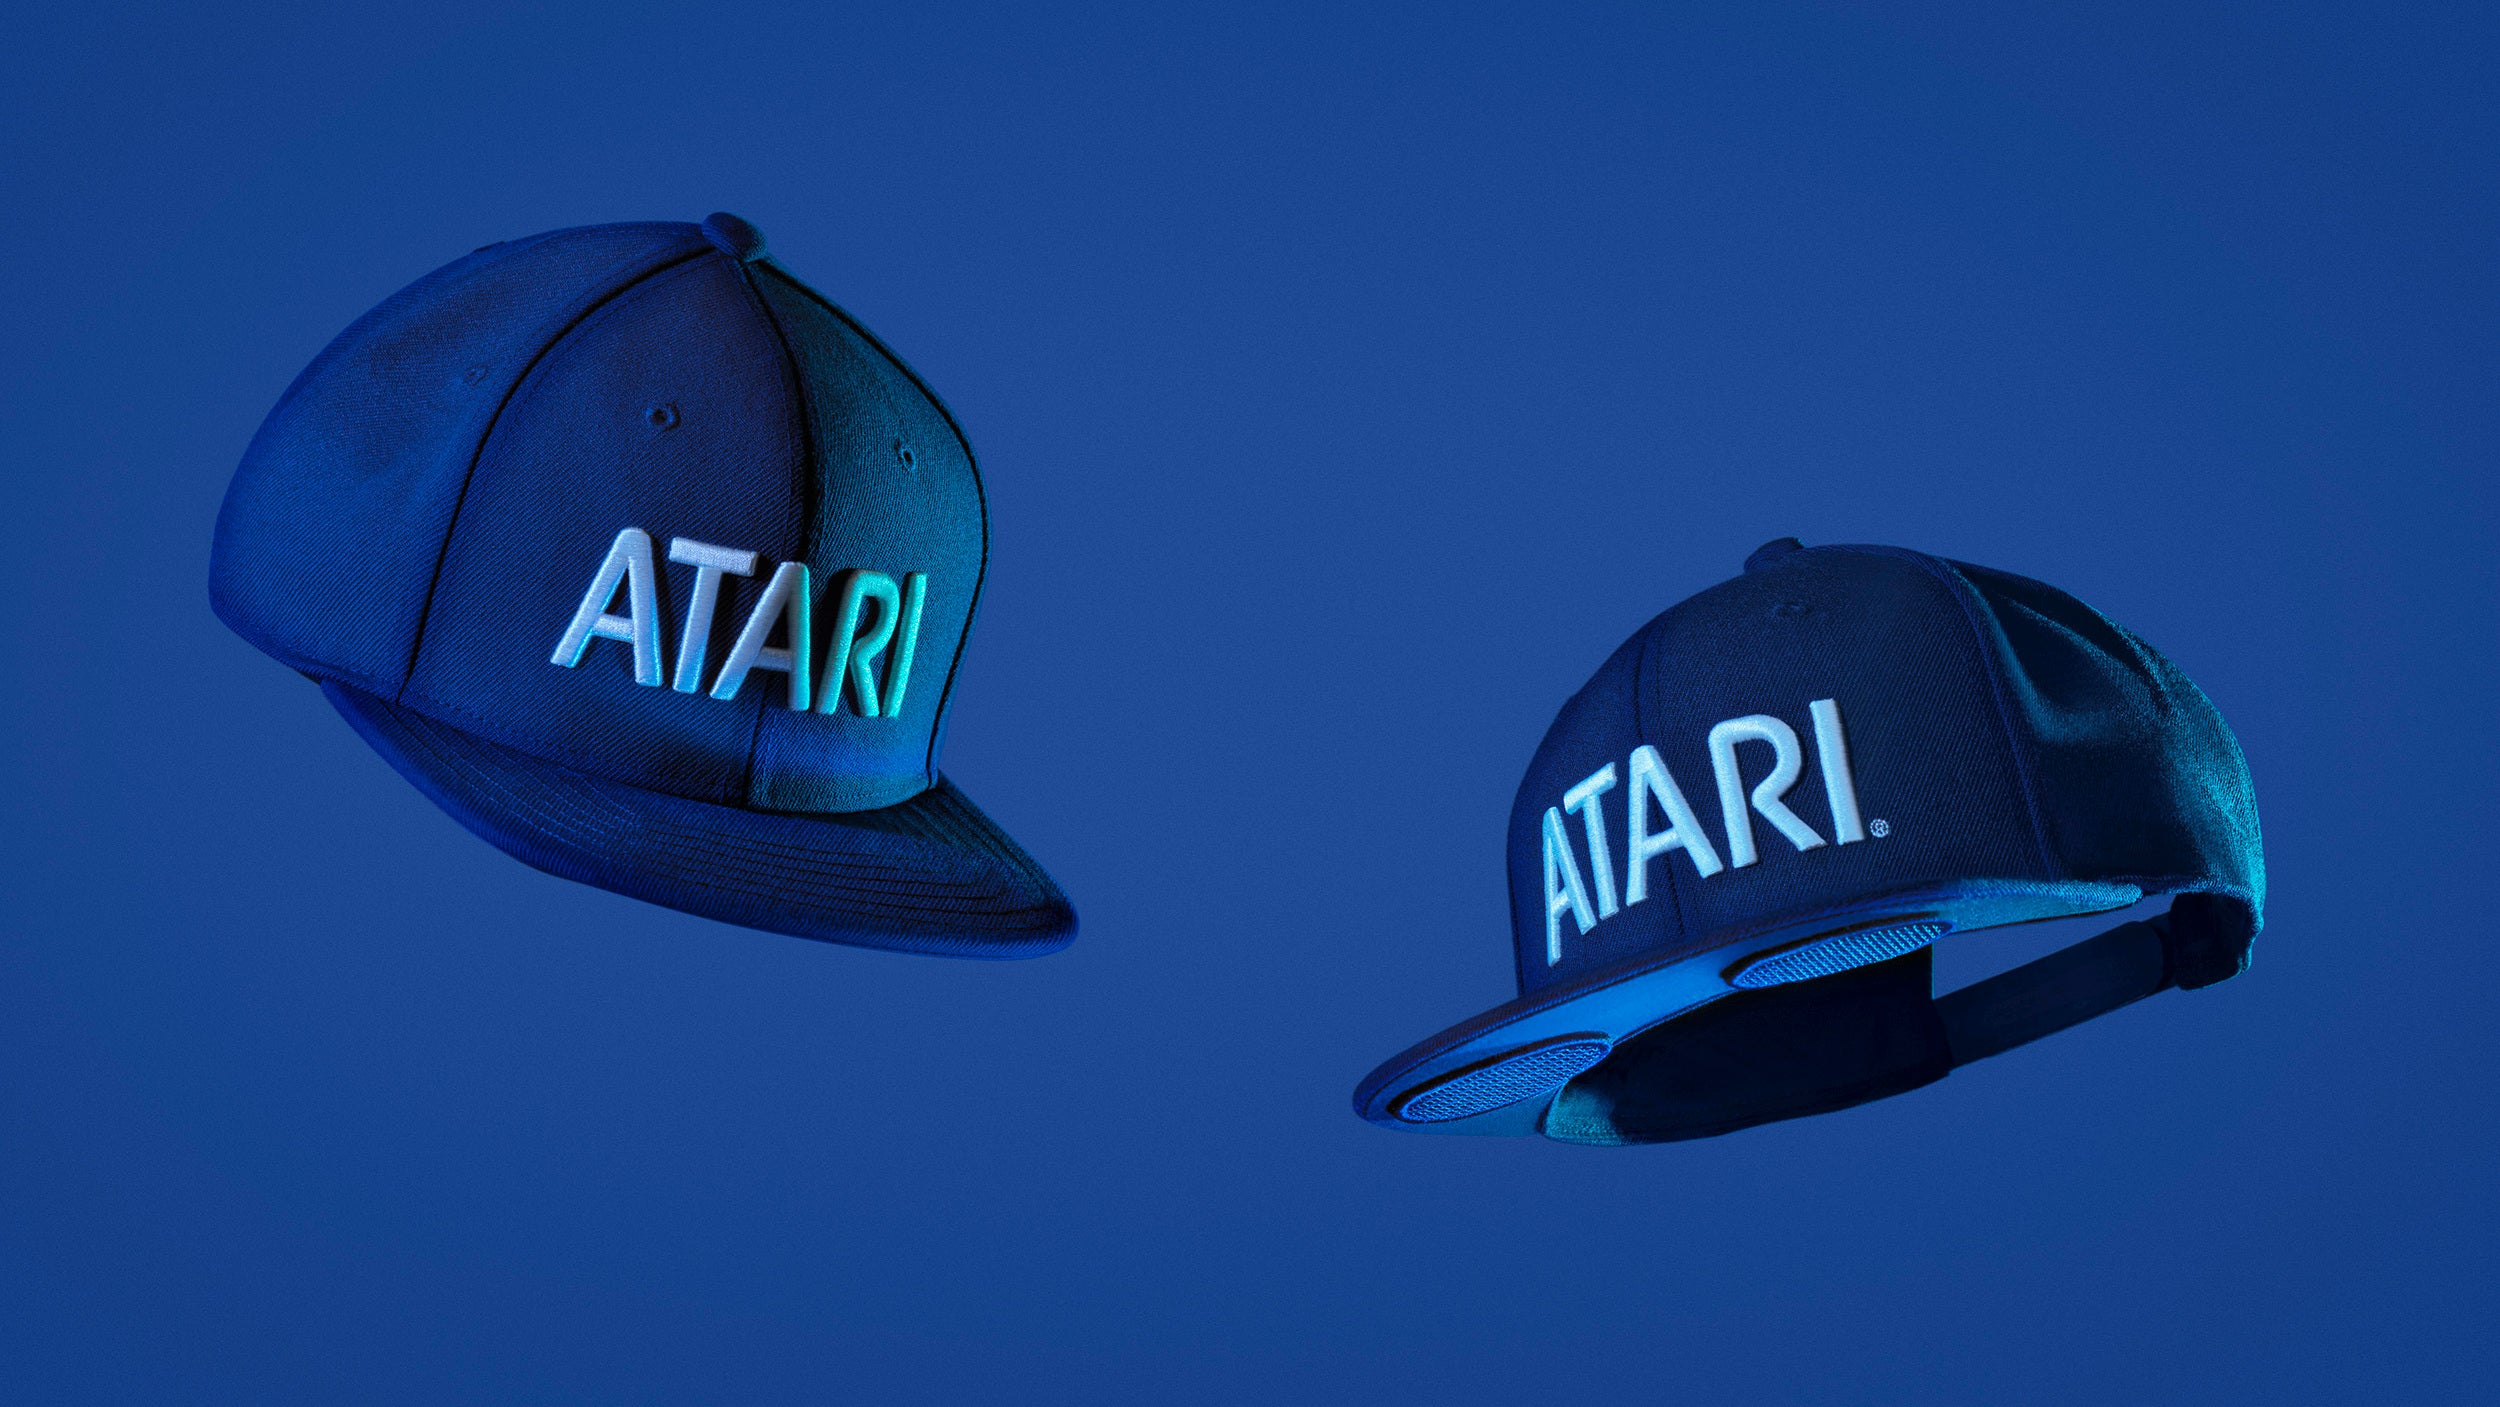 Atari's 'Speakerhat' Is The Arsehat Arsehats Have Been Waiting For